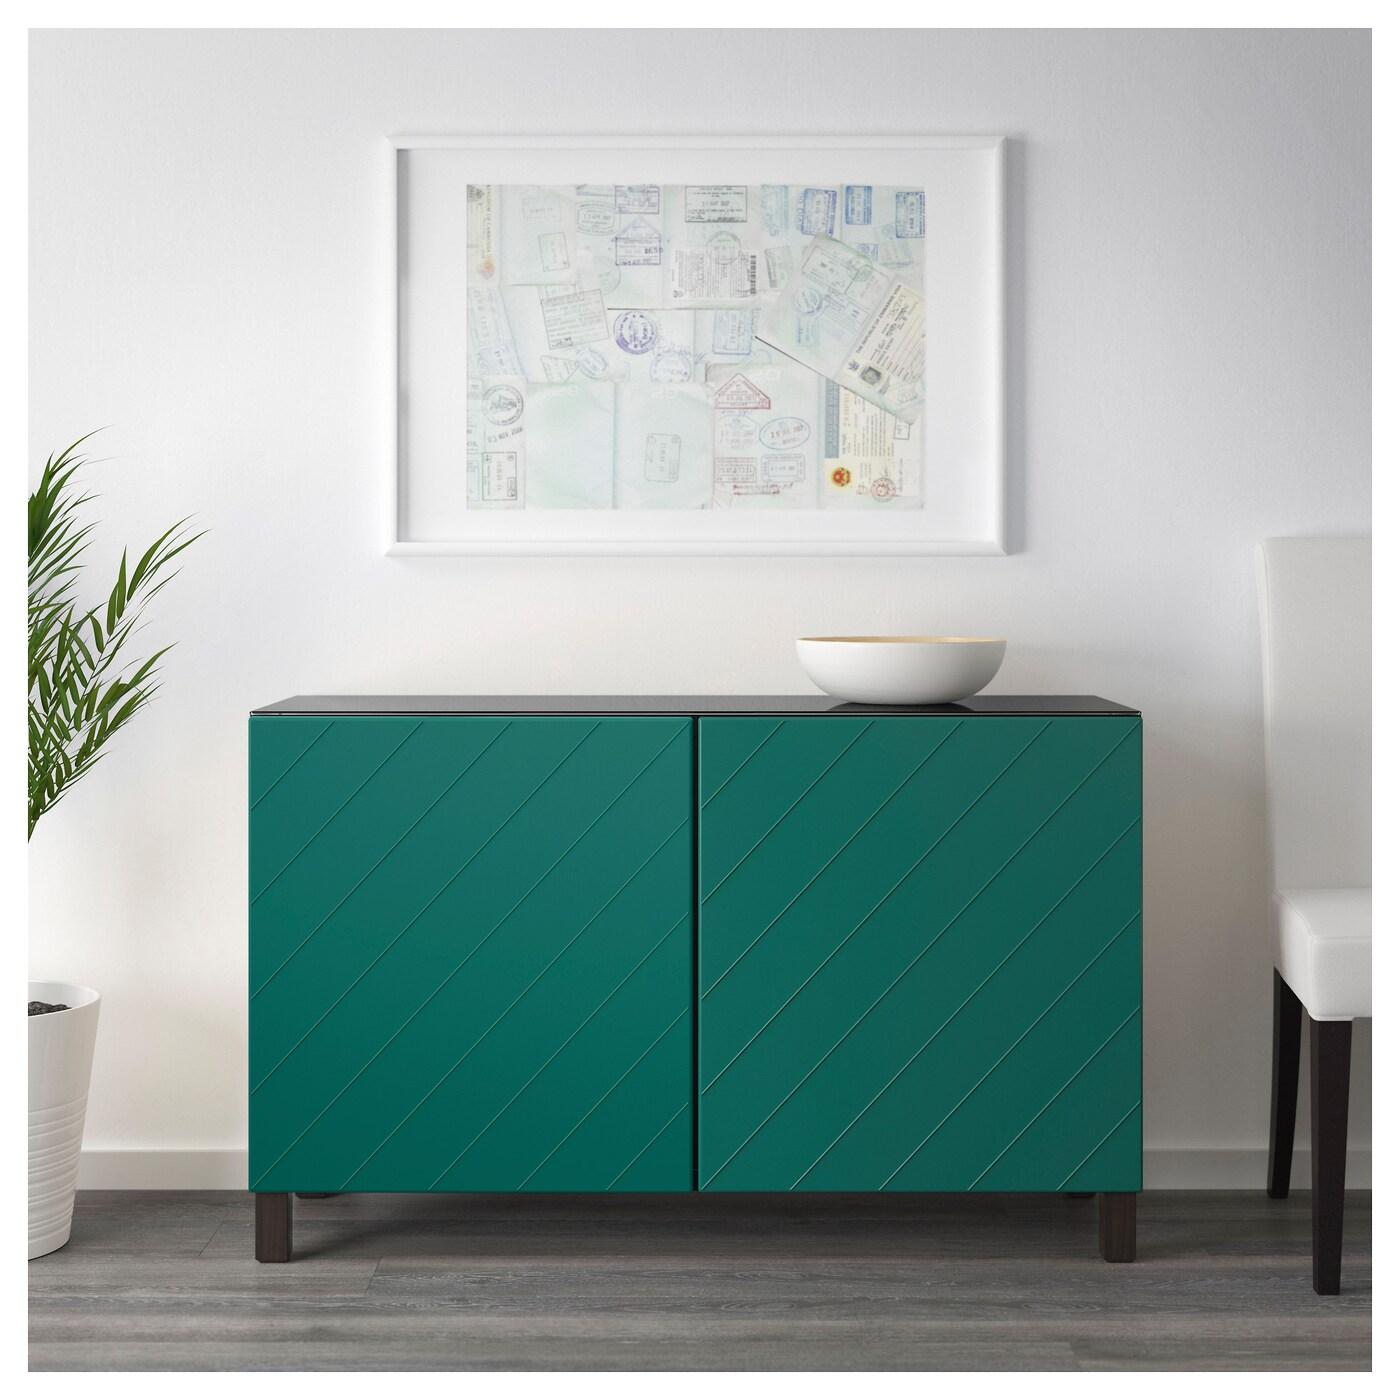 best combinaison rangement portes brun noir hallstavik bleu vert 120x40x74 cm ikea. Black Bedroom Furniture Sets. Home Design Ideas